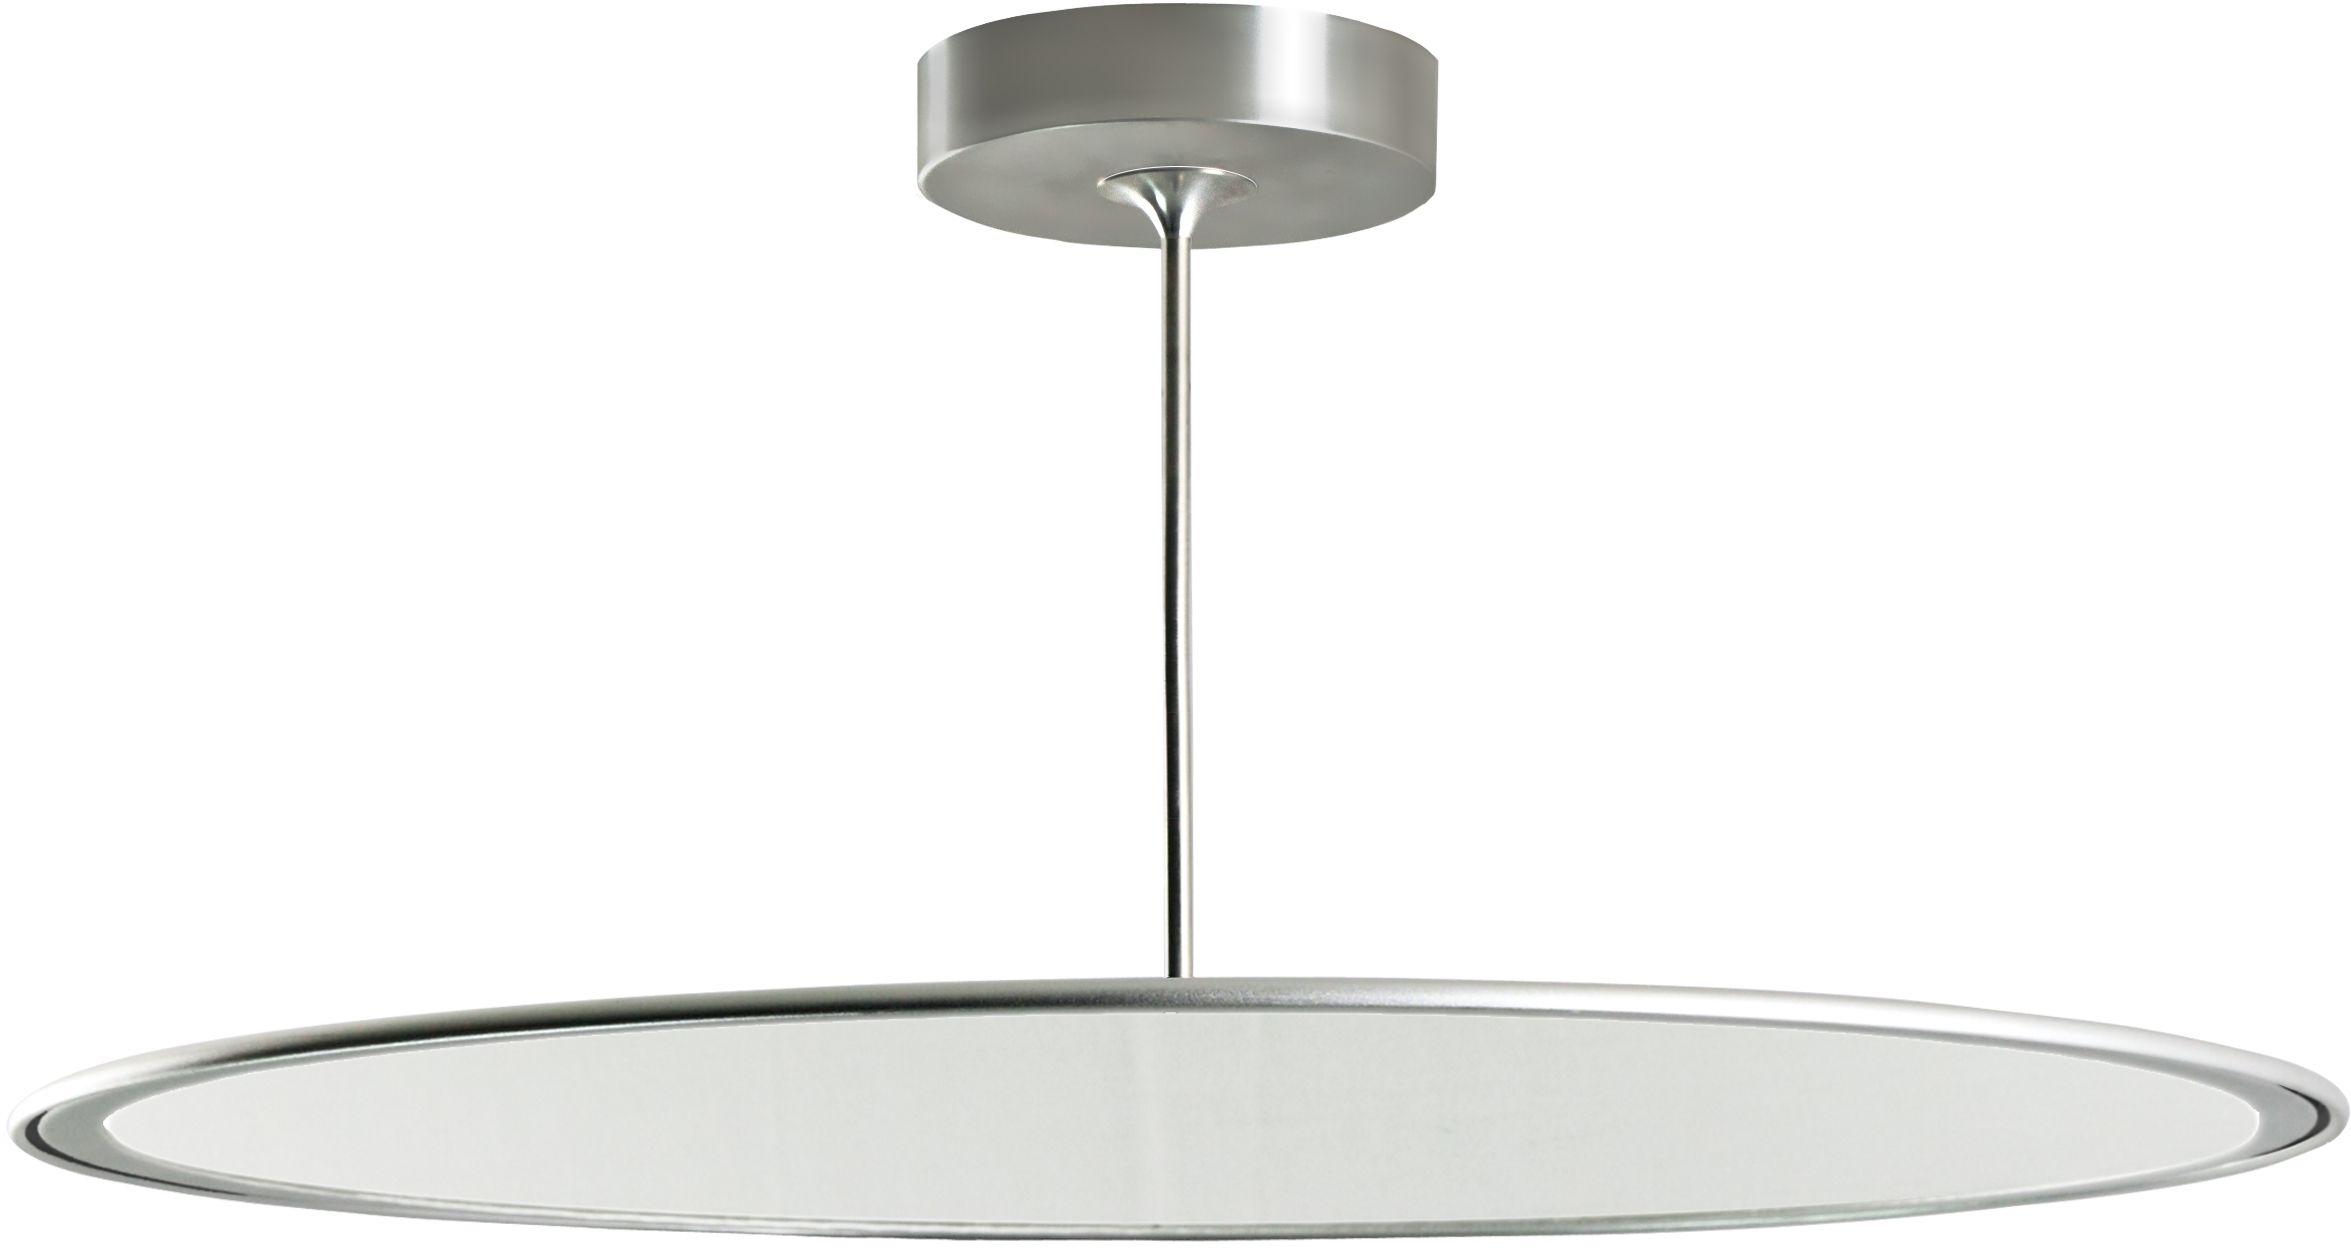 Similed Luxuni Lighting Dsgn Lamp Light